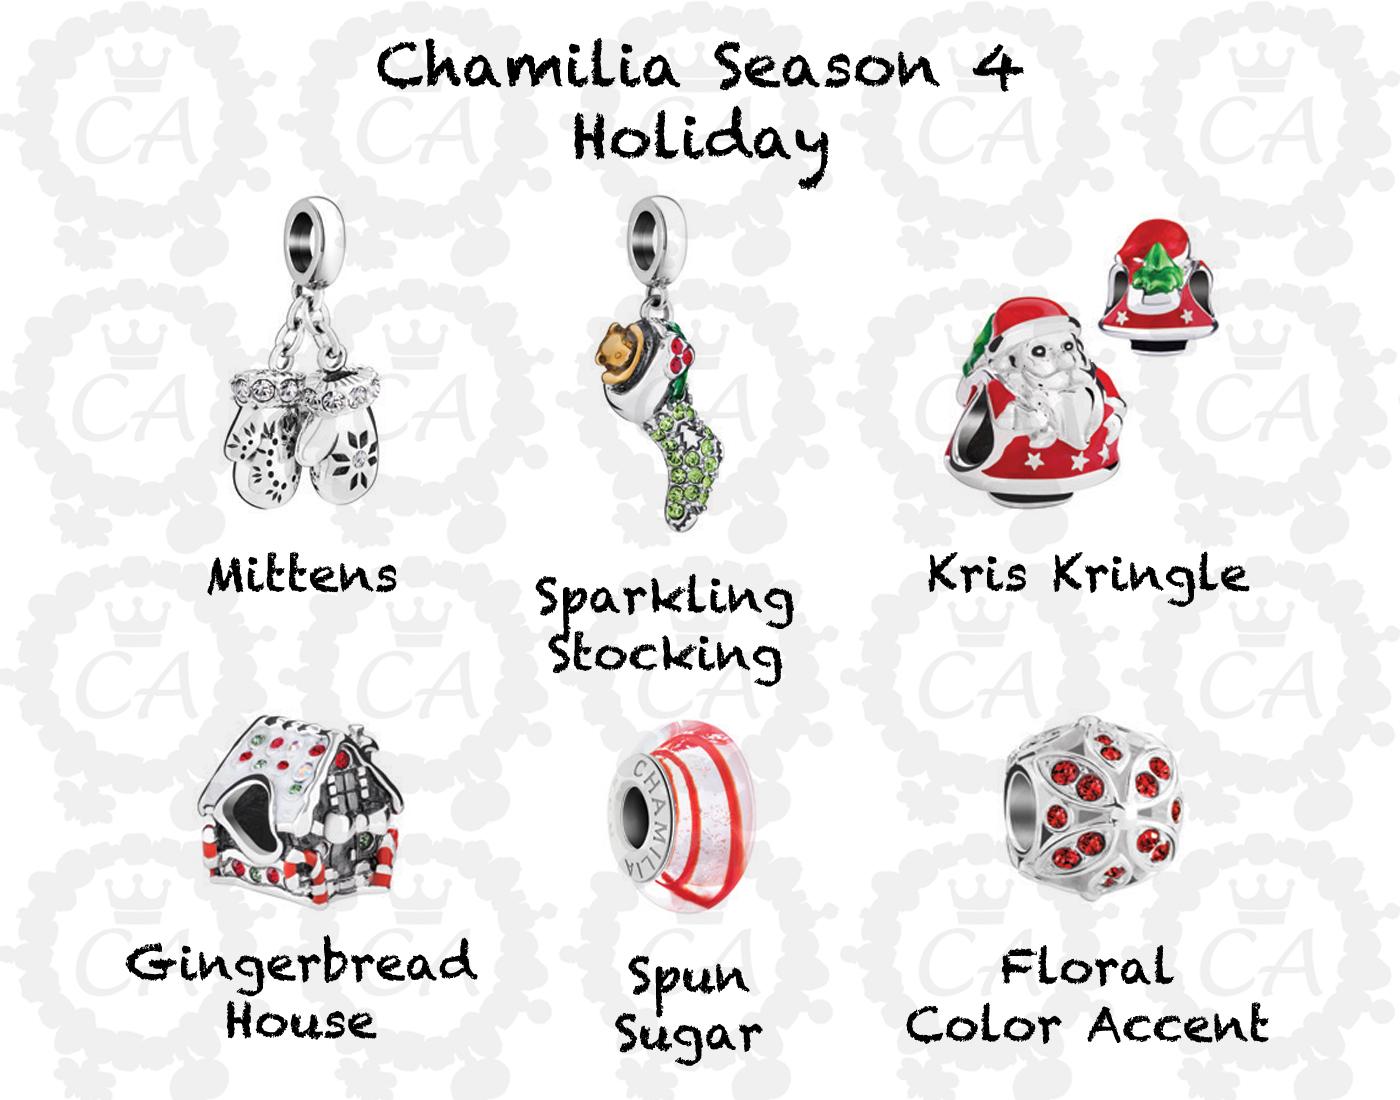 Chamilia Holiday Season 4 Collection Preview